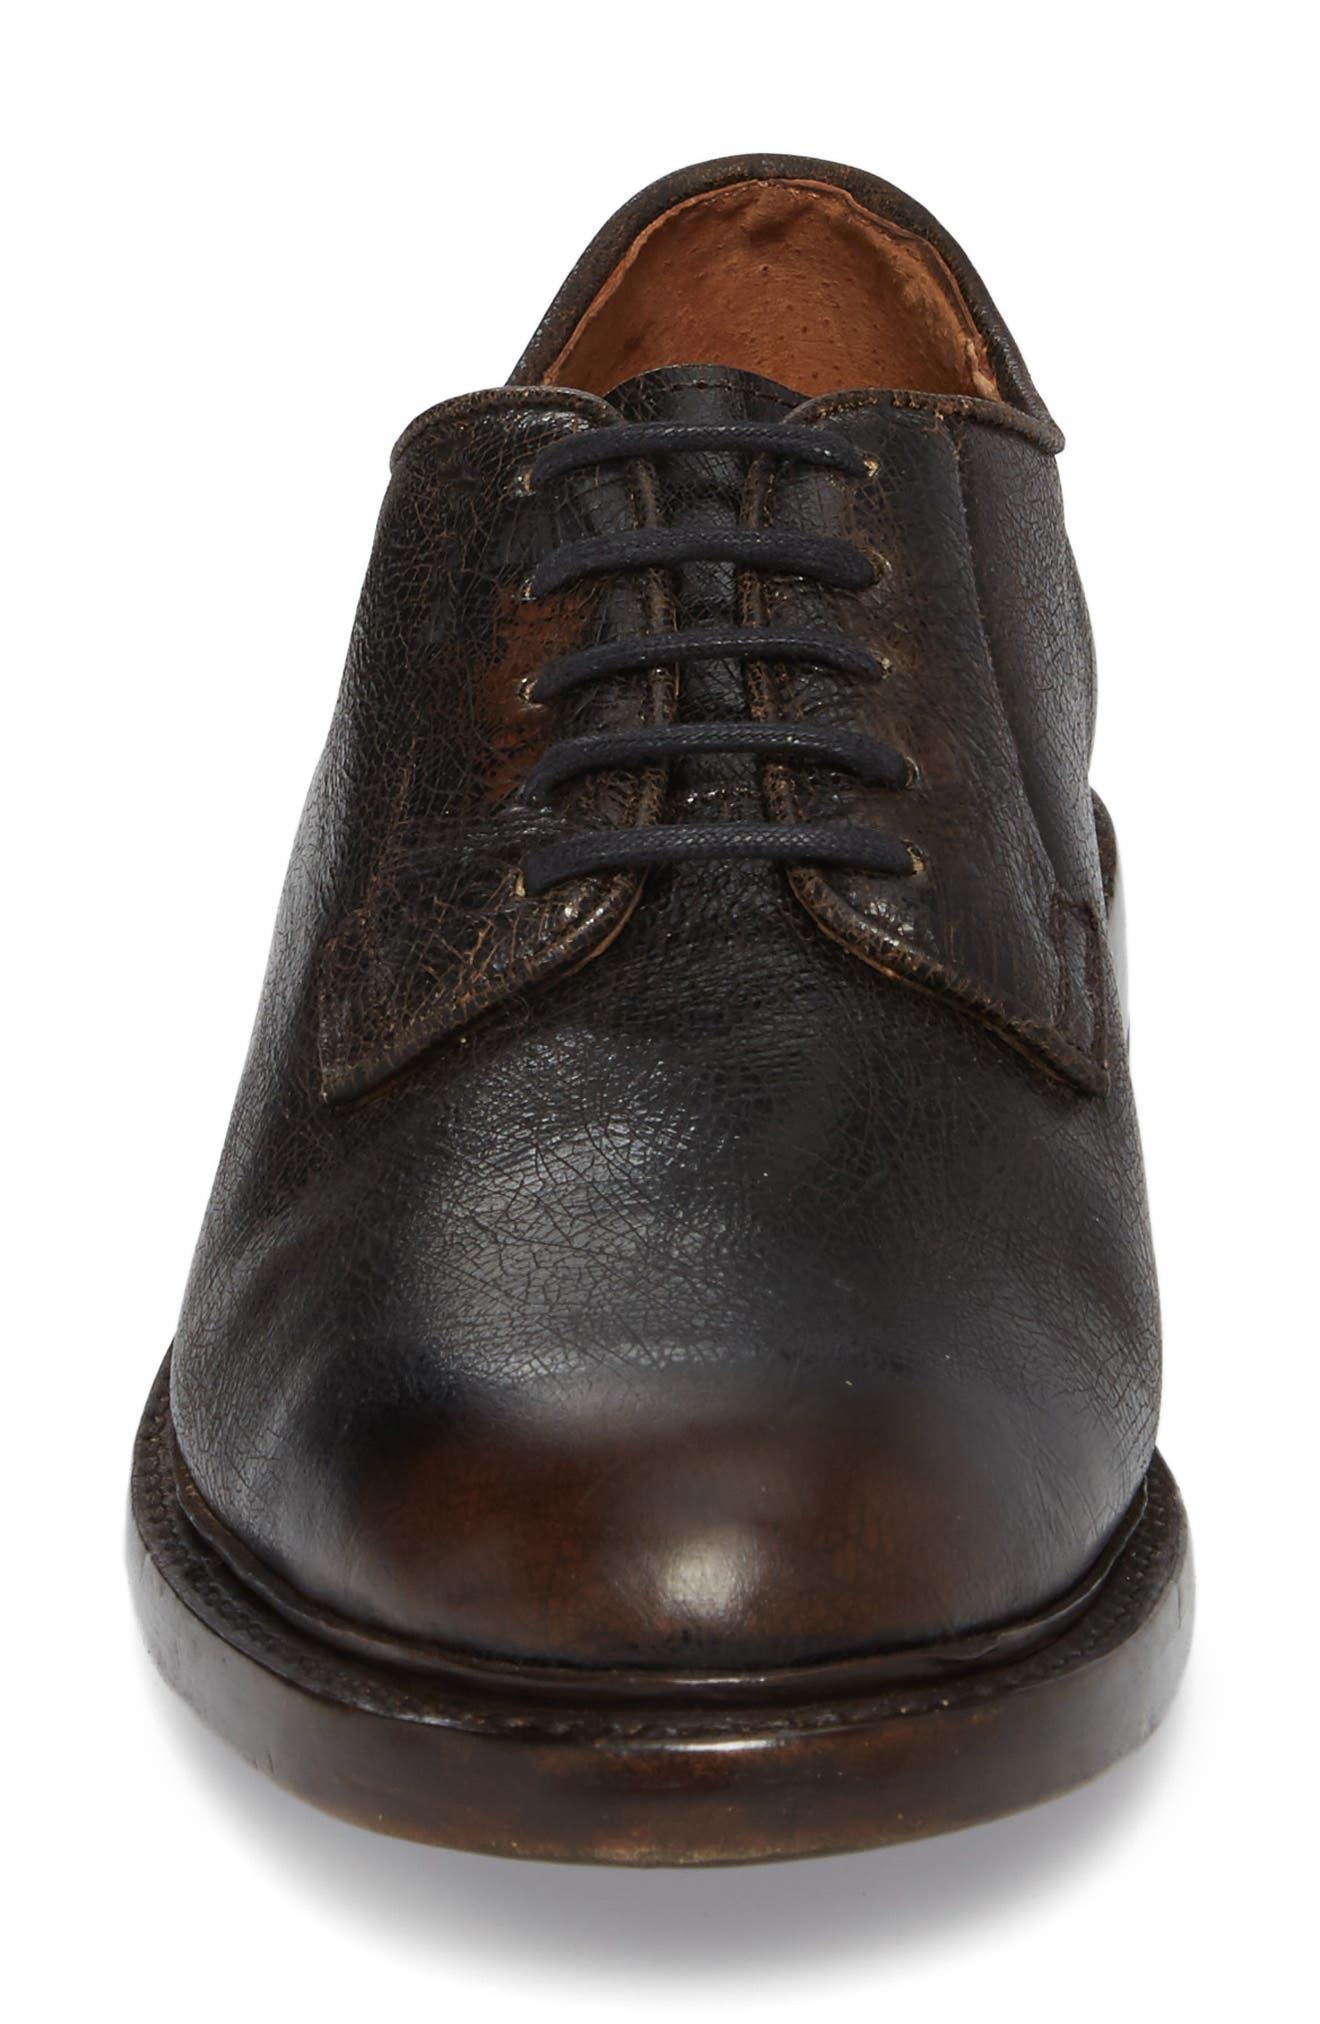 Jones Plain Toe Derby,                             Alternate thumbnail 4, color,                             Dark Brown Leather